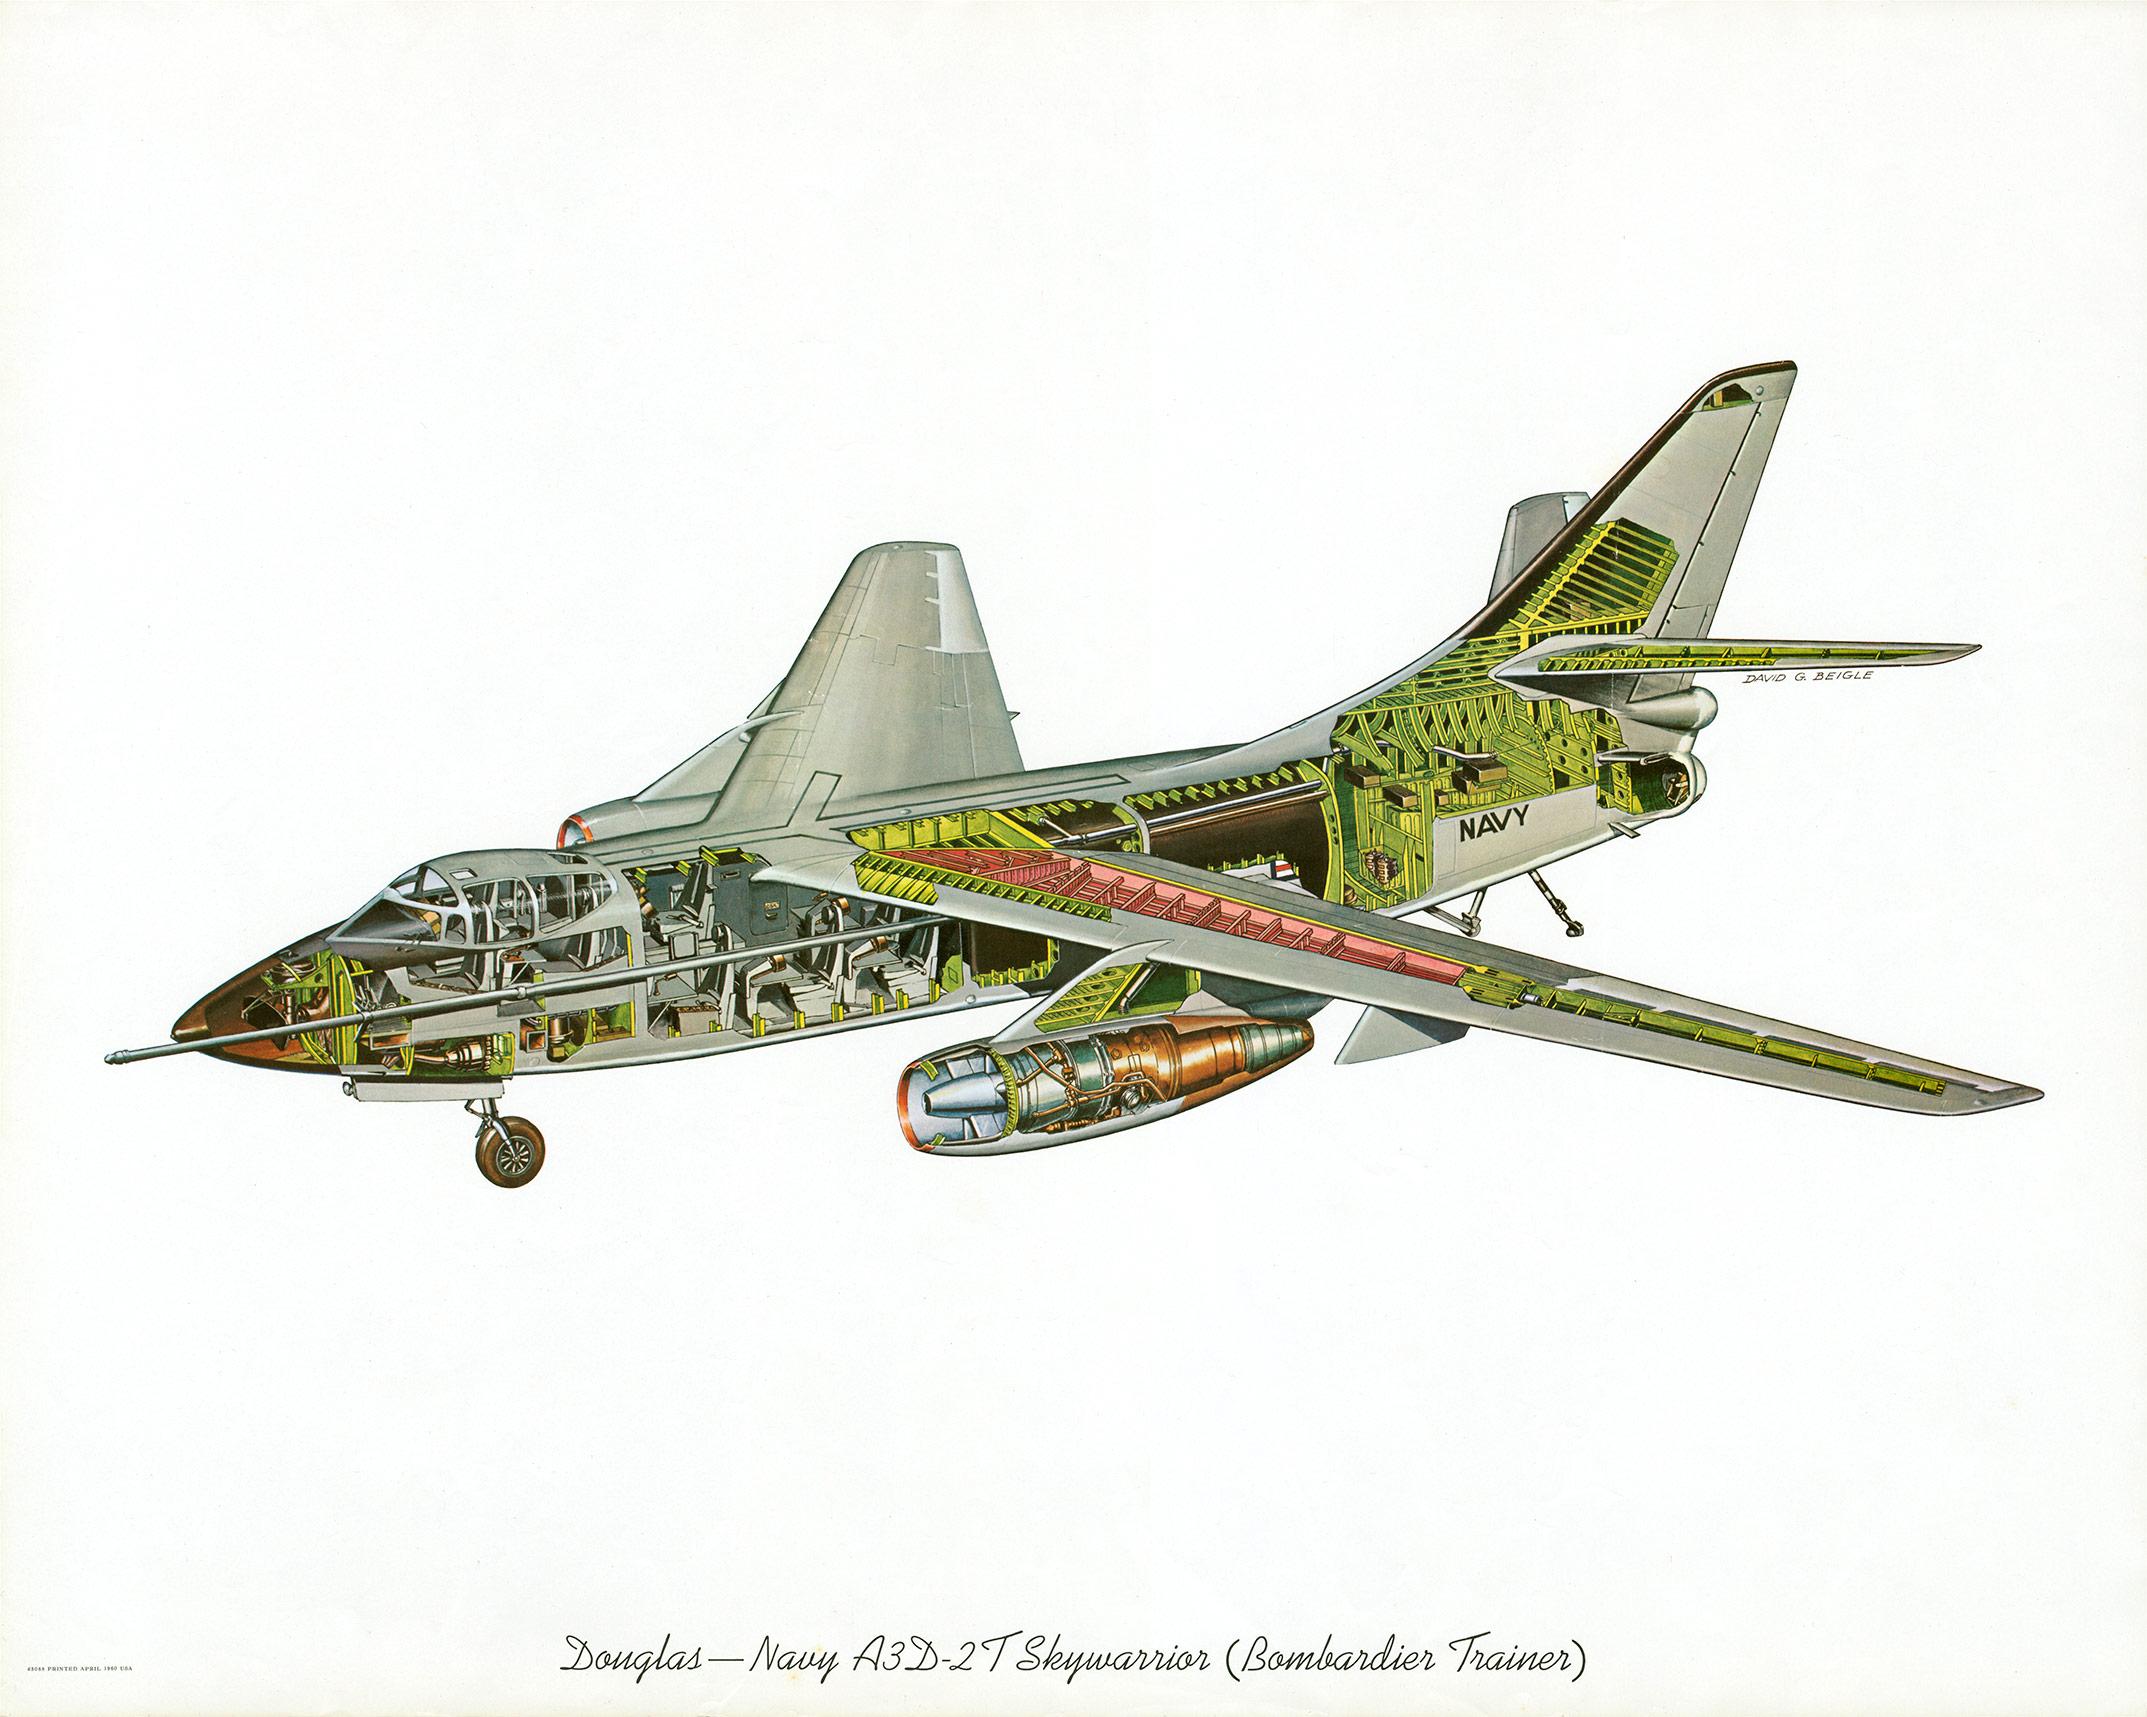 Douglas A-3 Skywarrior cutaway